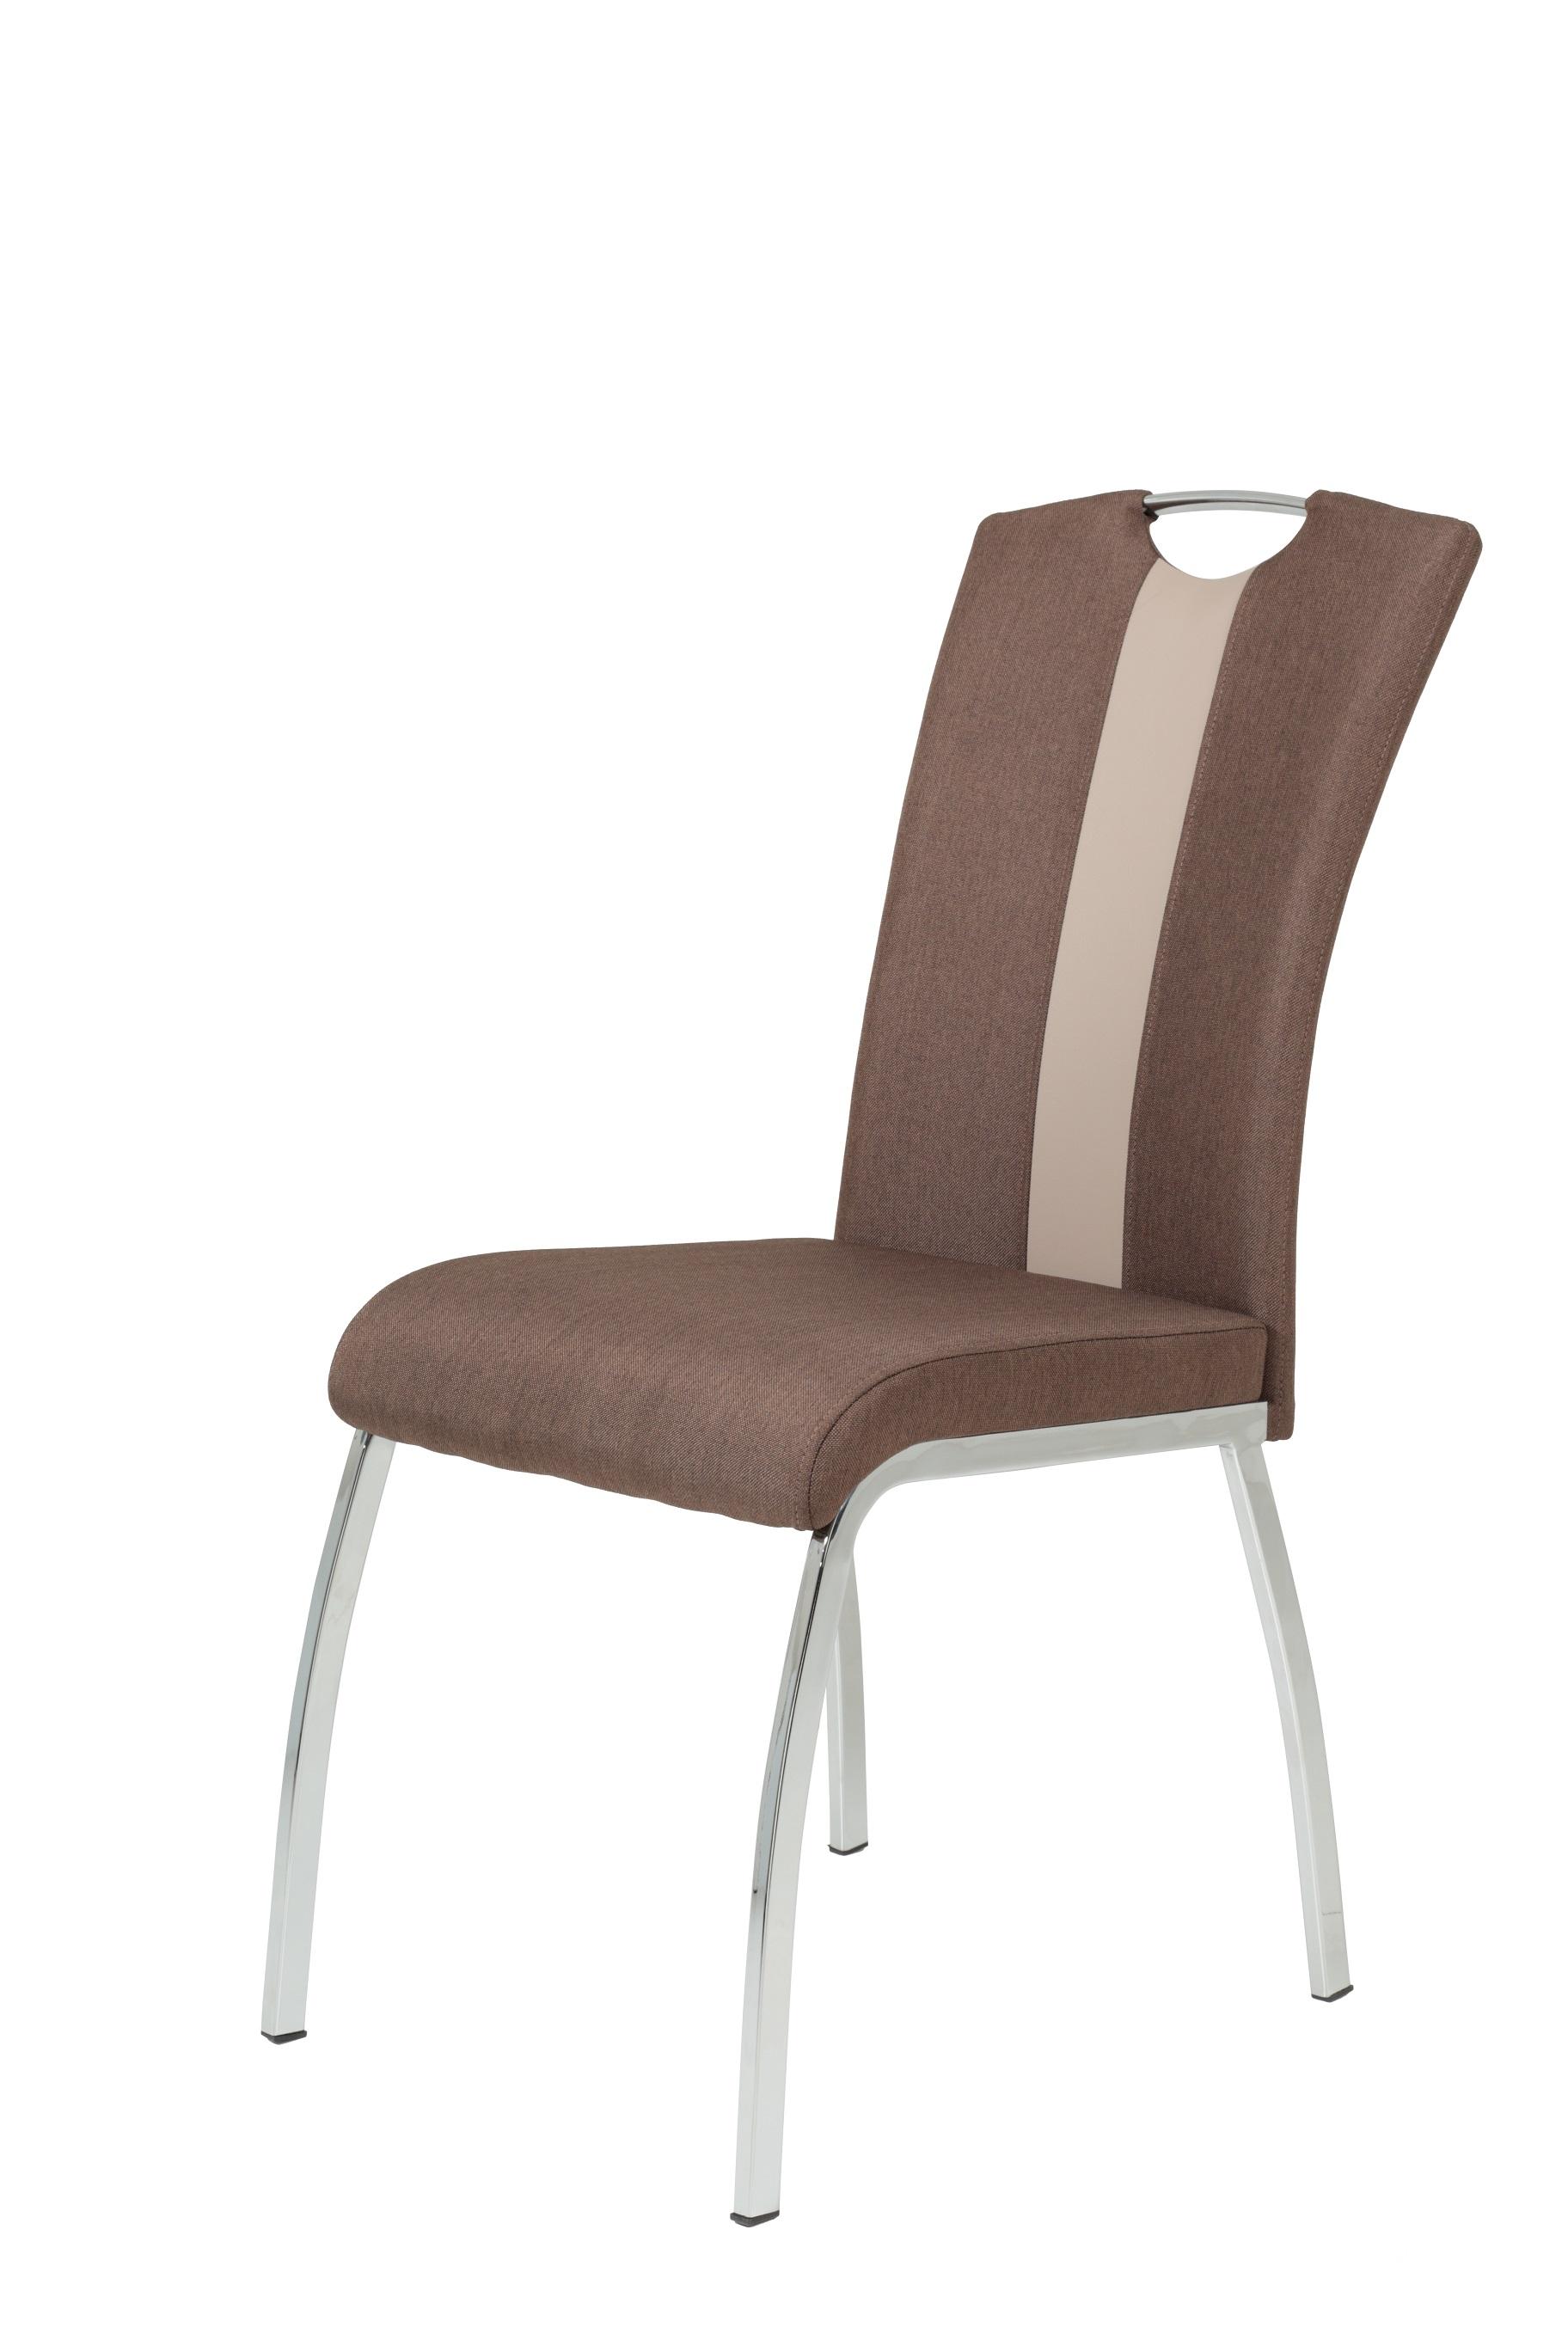 2 Stühle=Set Küchenstuhl Esszimmerstuhl Stuhl Amber 3 Webstoff Braun Kunstleder Beige